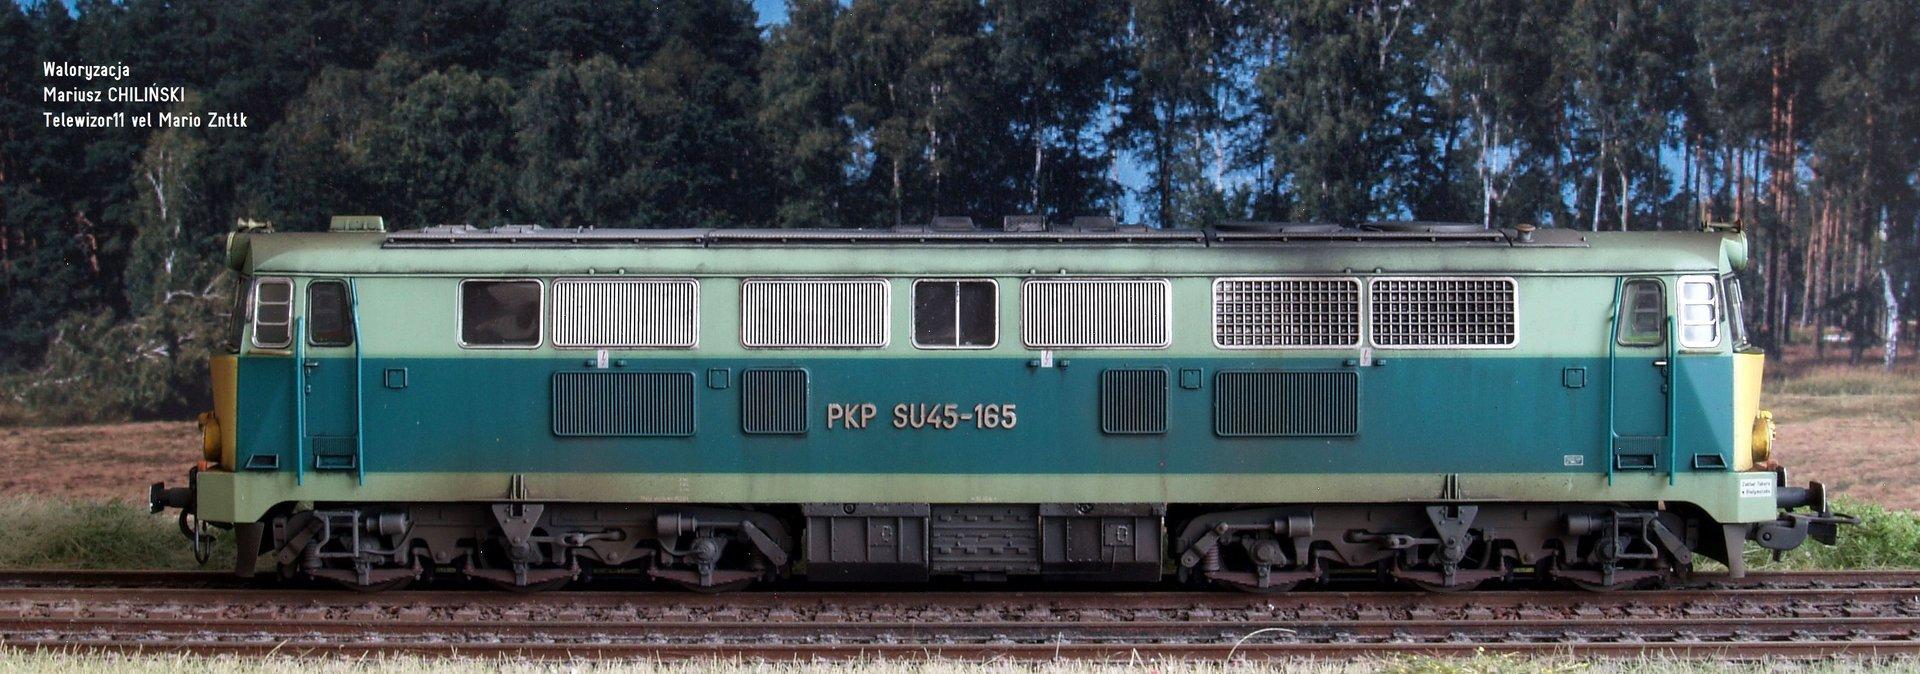 P1011855.JPG